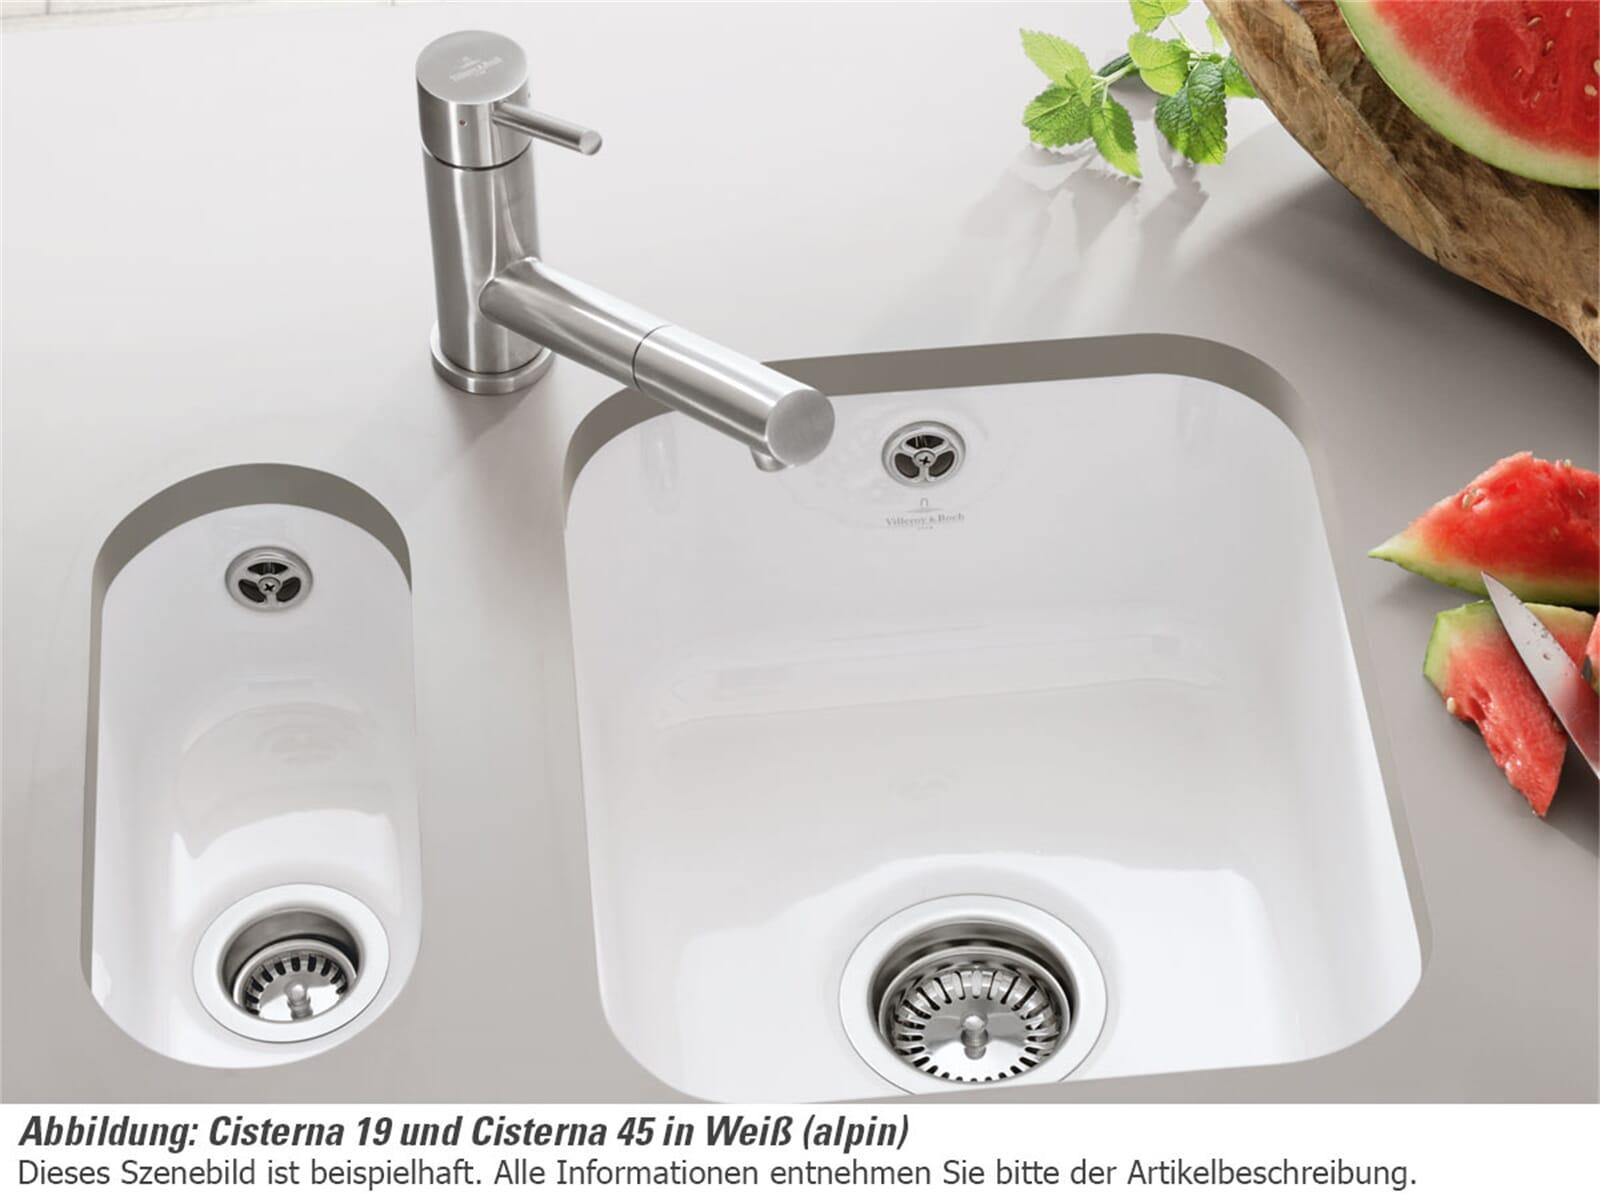 Villeroy & Boch Cisterna 45 Almond - 6704 02 AM Keramikspüle Exzenterbetätigung